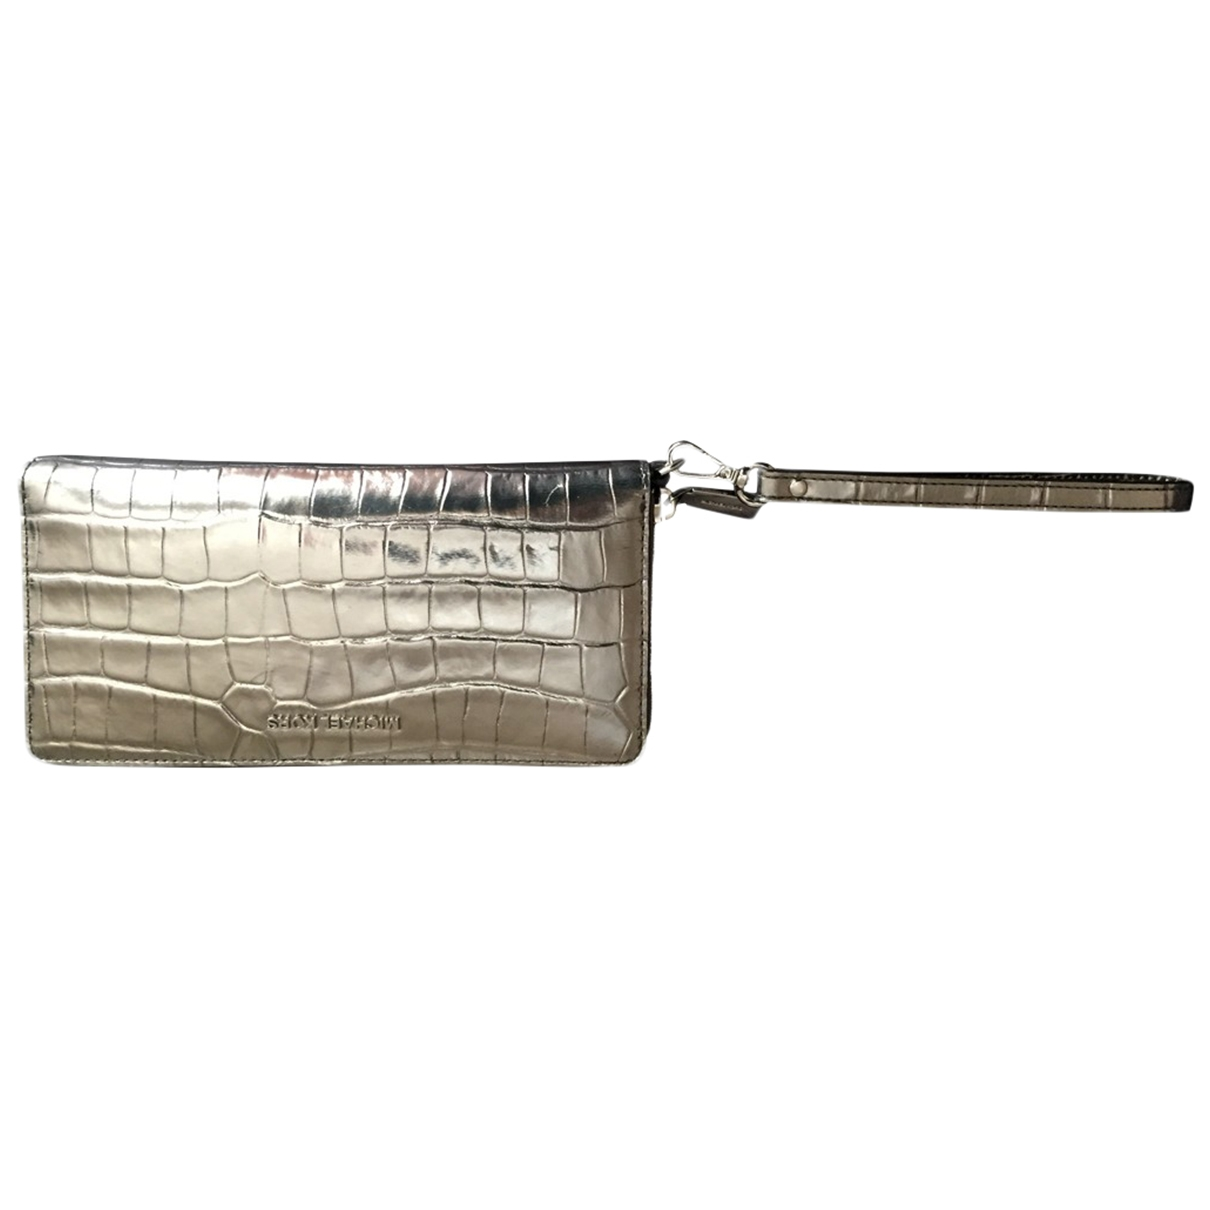 Michael Kors \N Silver Leather wallet for Women \N